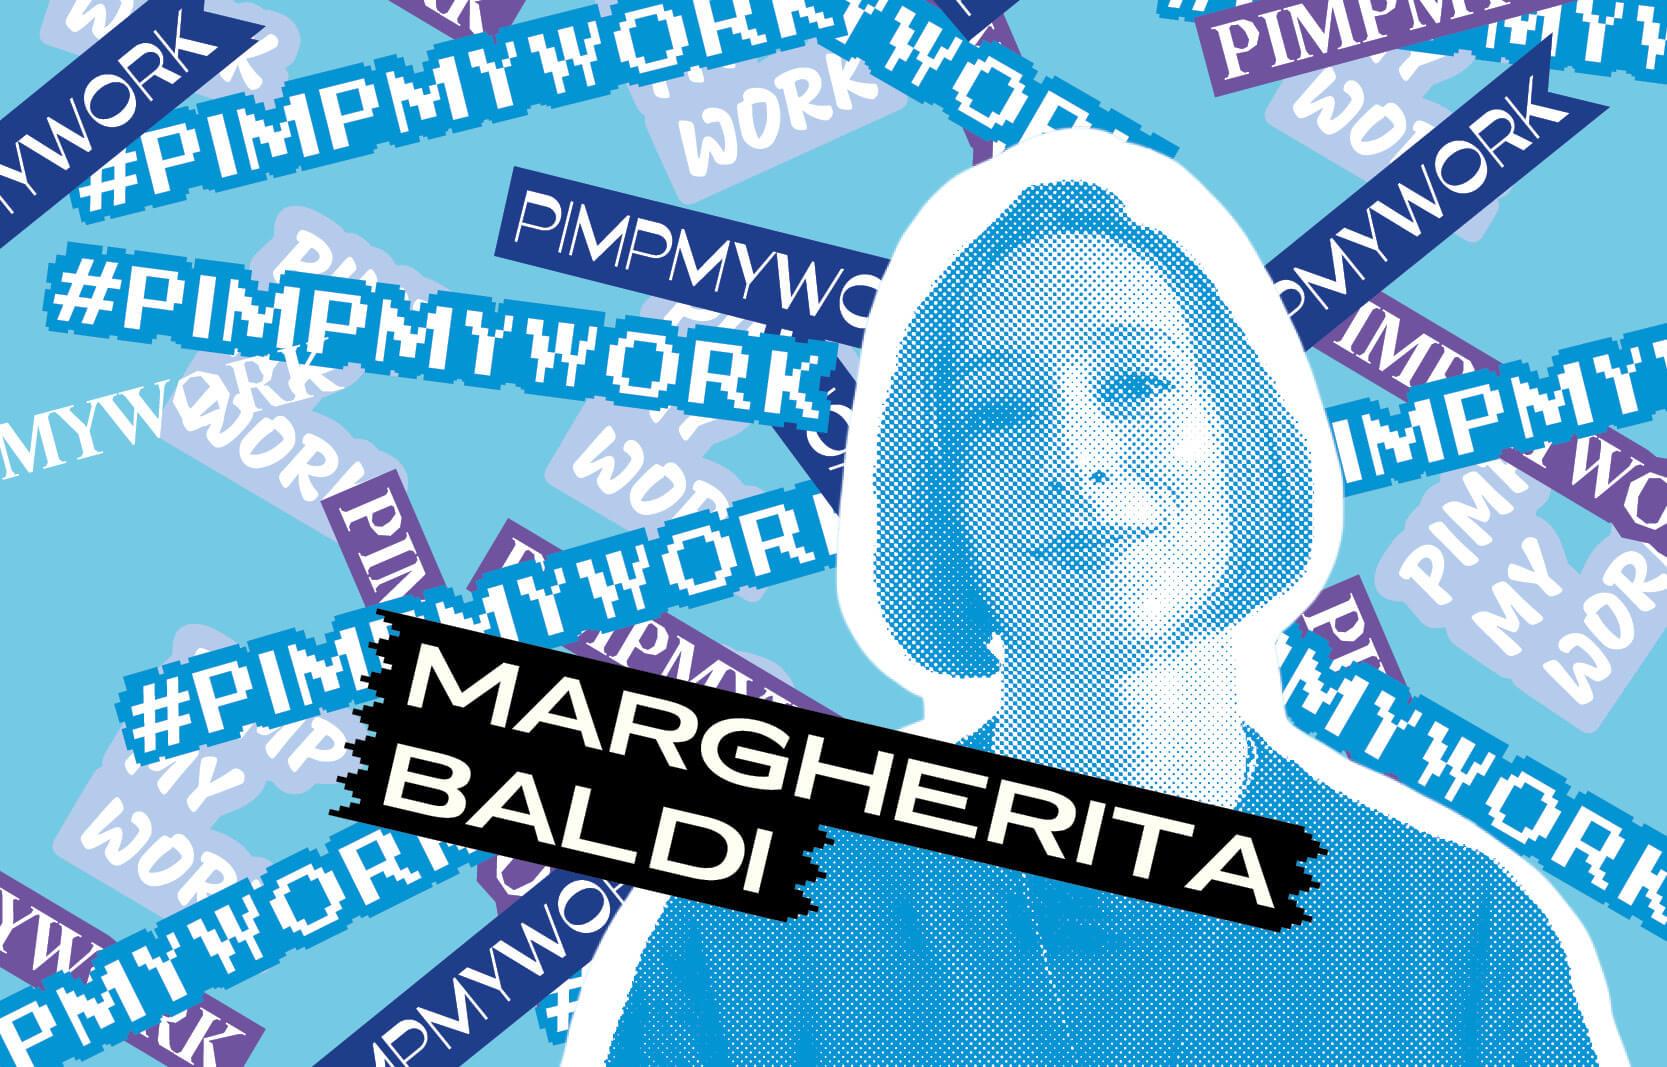 Margherita Baldi